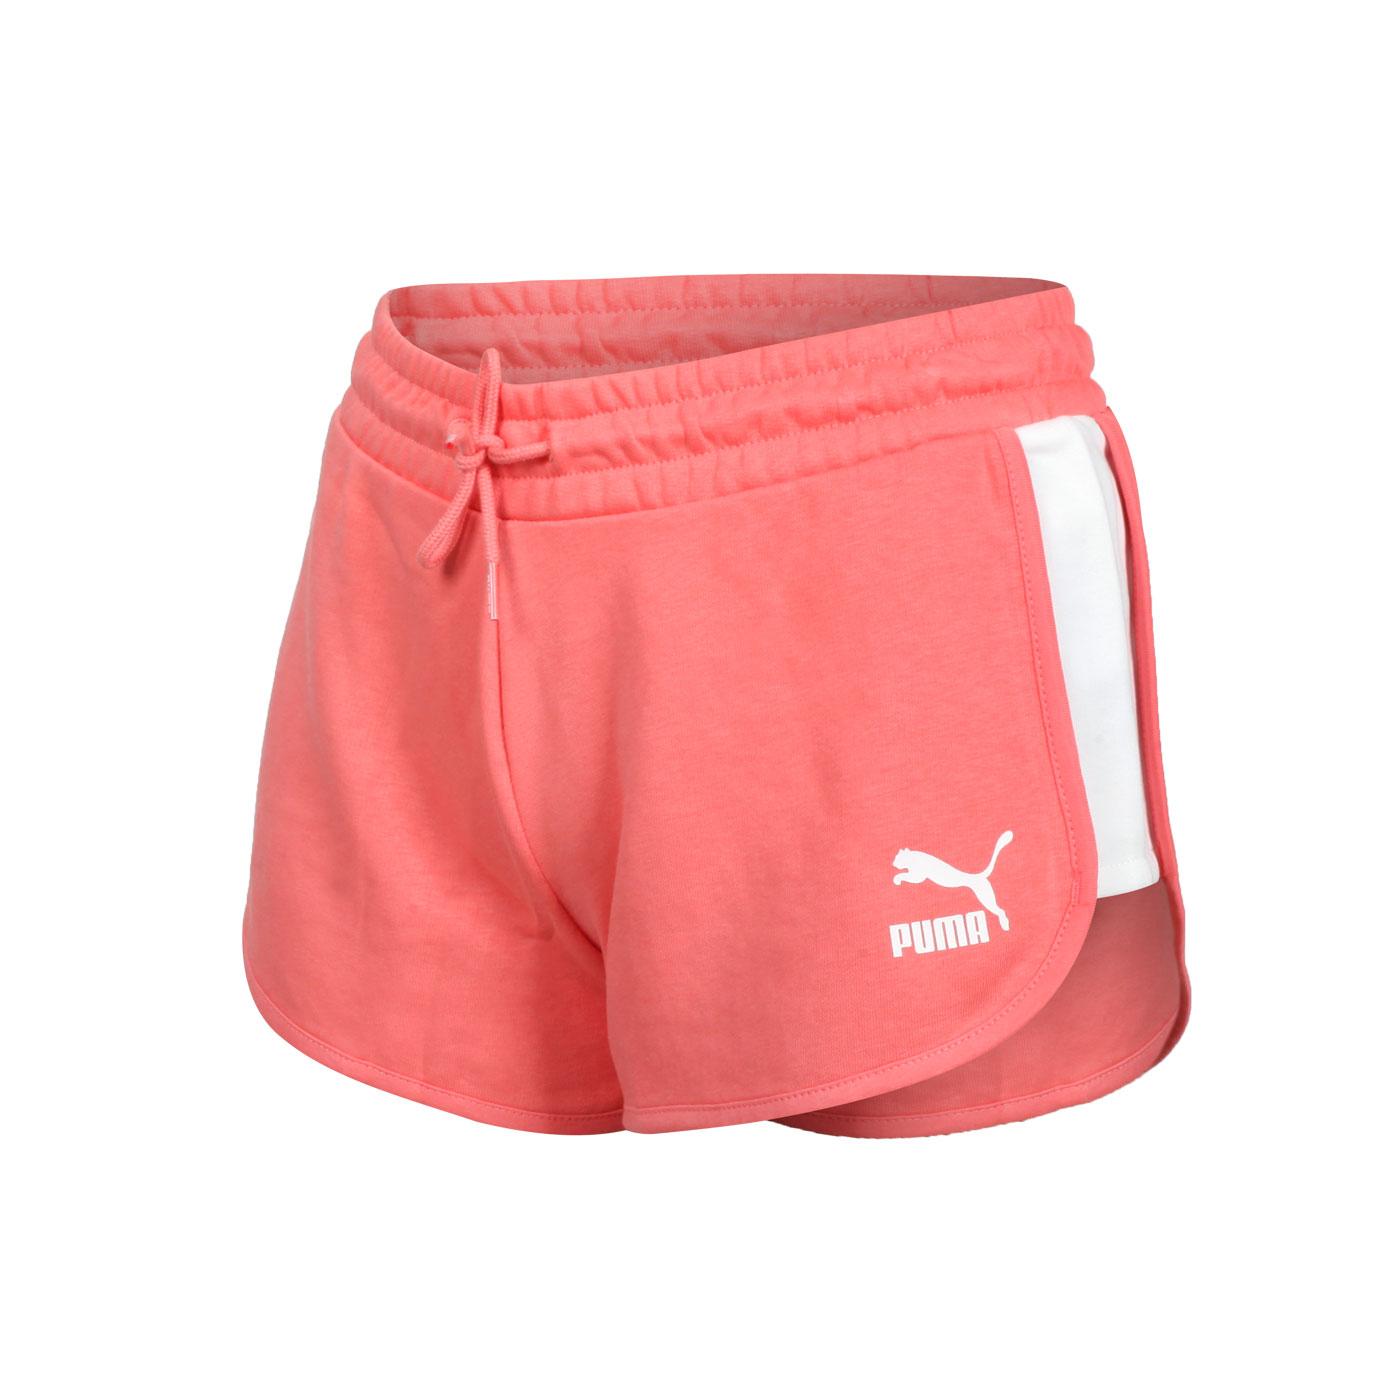 PUMA 女款流行系列T7短褲 53023724 - 珊瑚橘白